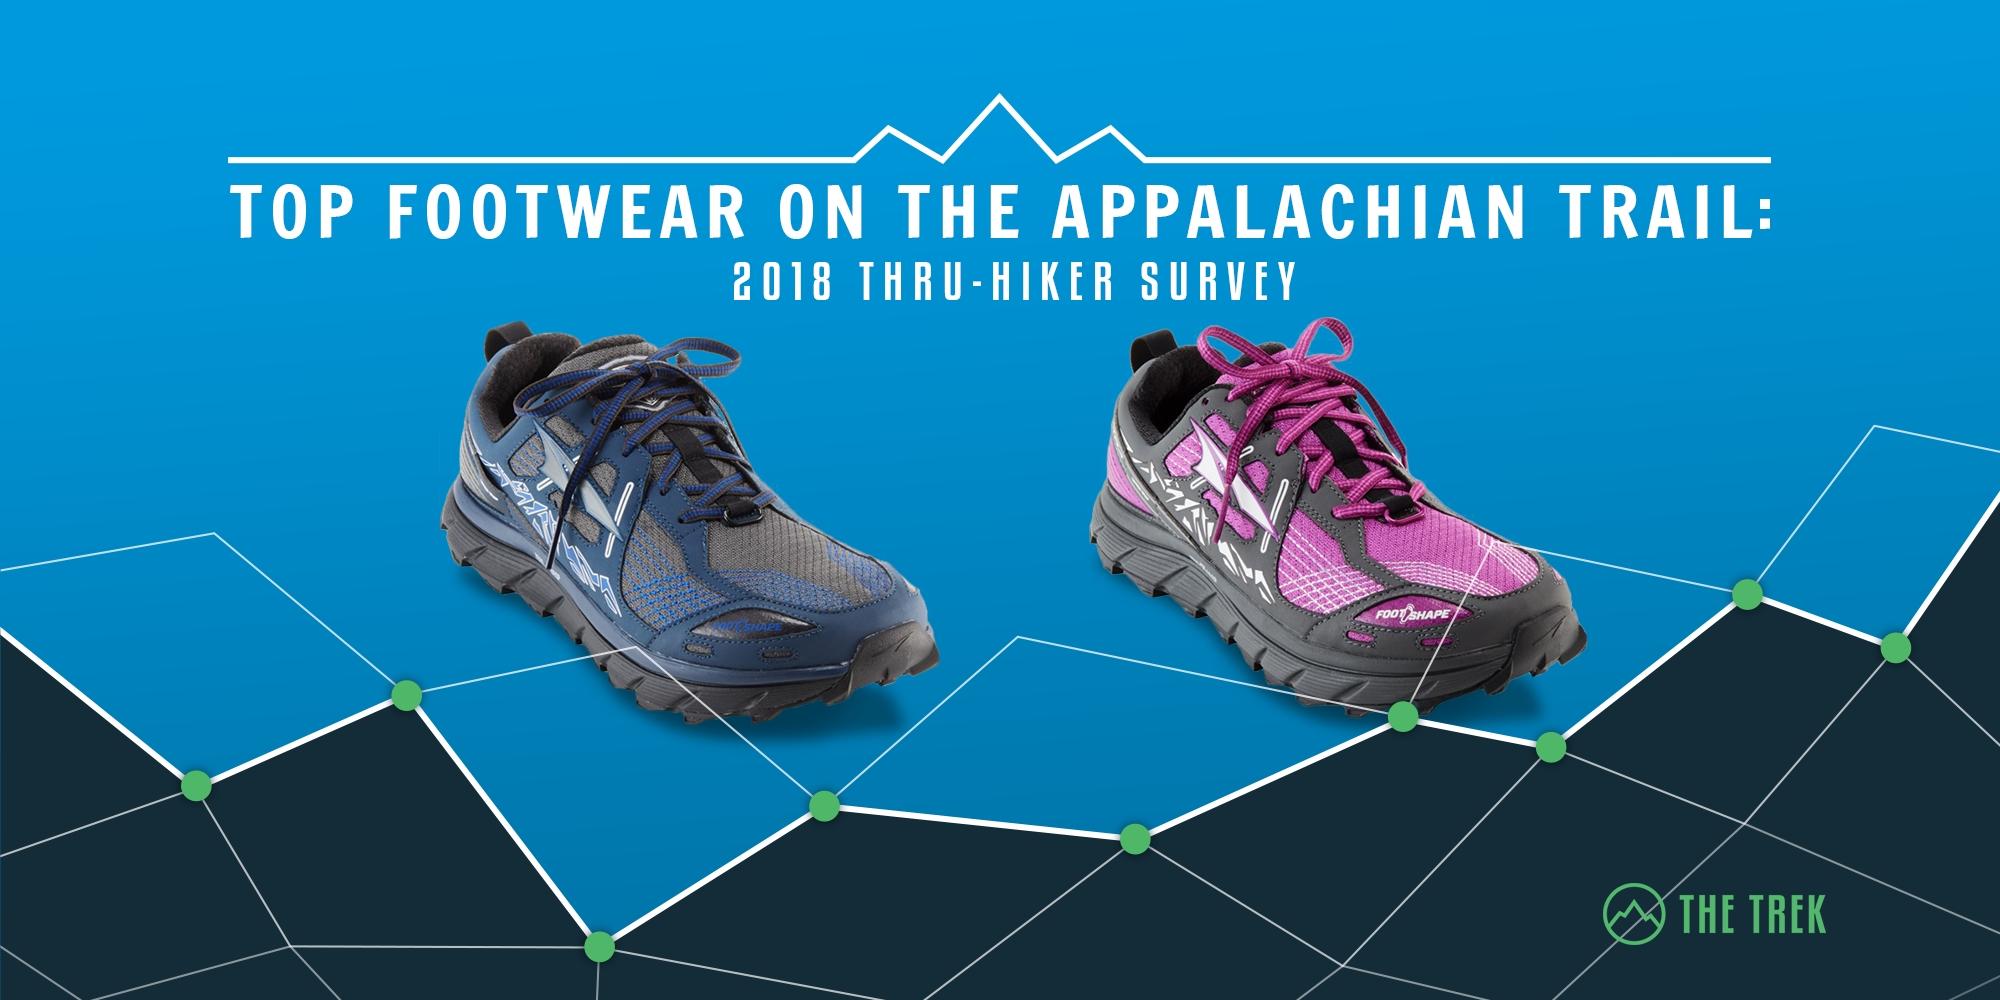 Top Footwear on the Appalachian Trail: 2018 Thru-Hiker Survey